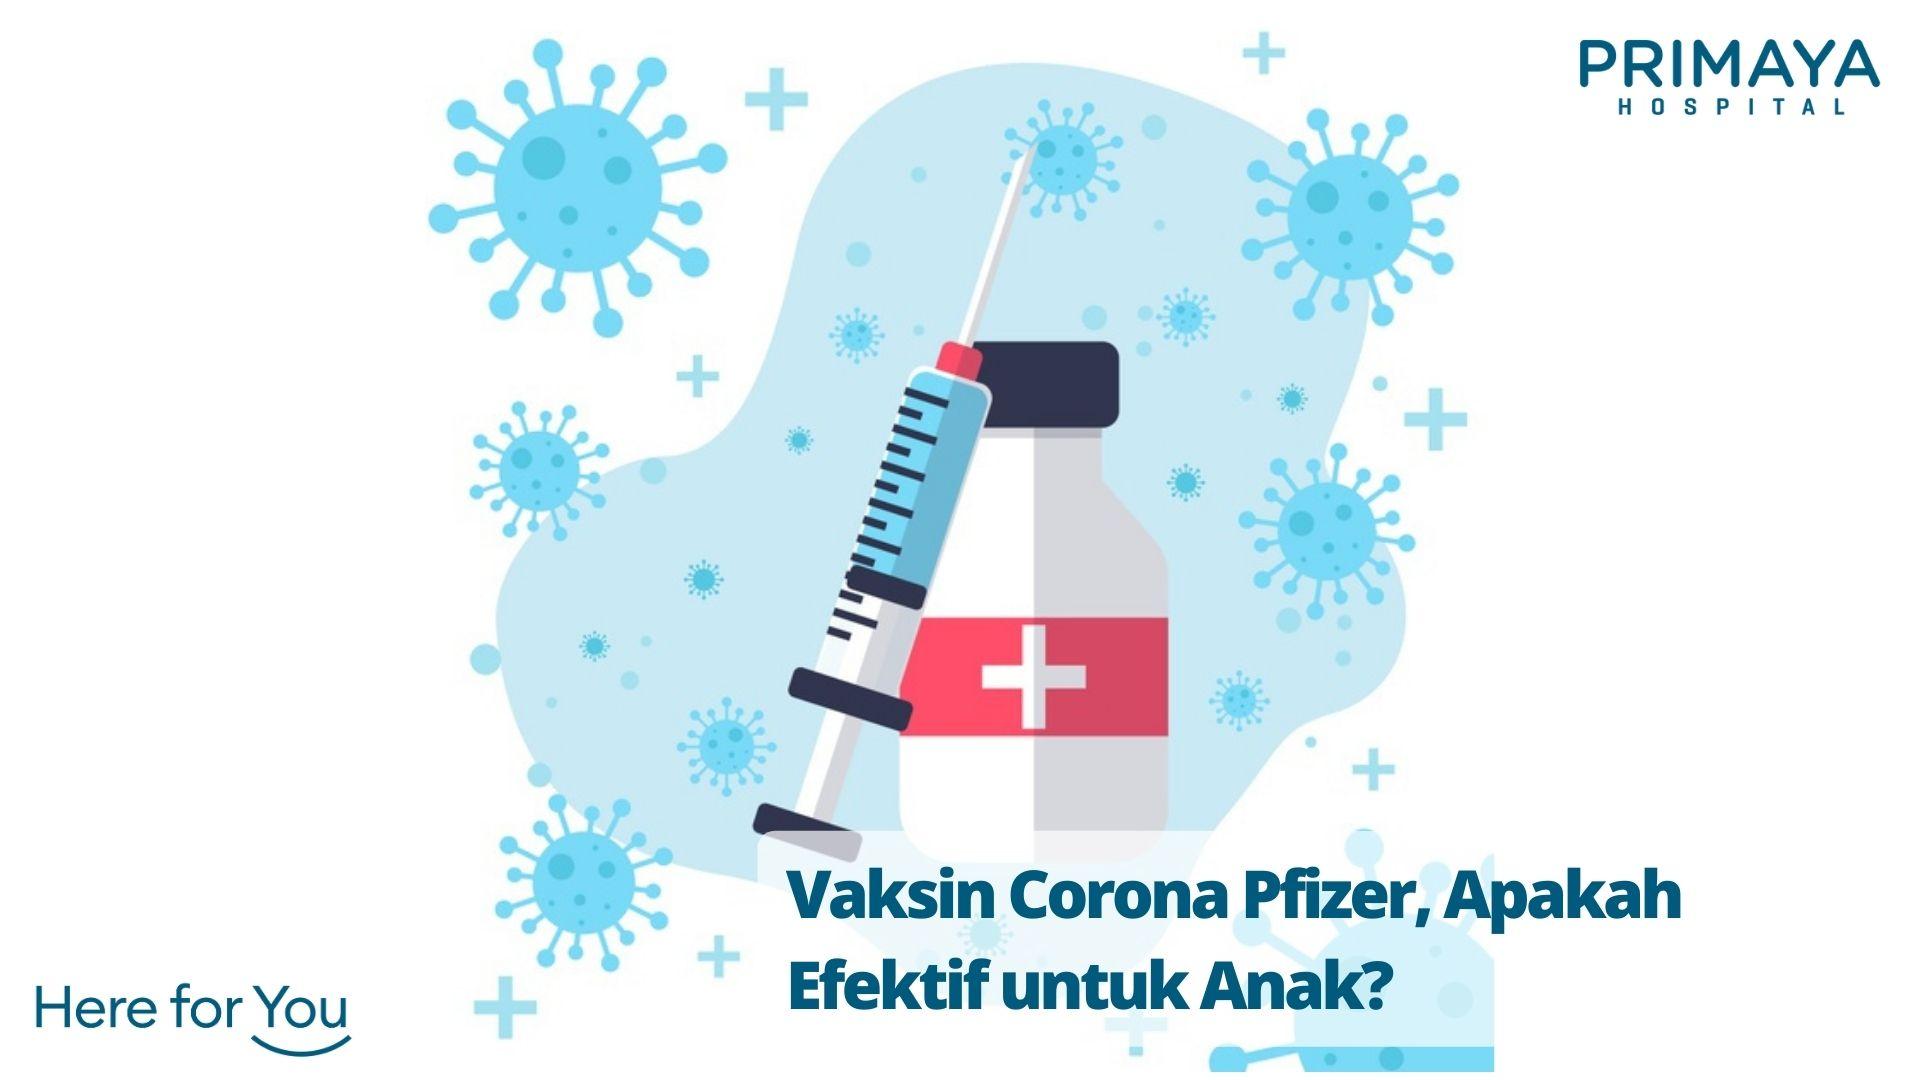 Vaksin Corona Pfizer, Apakah Efektif untuk Anak_